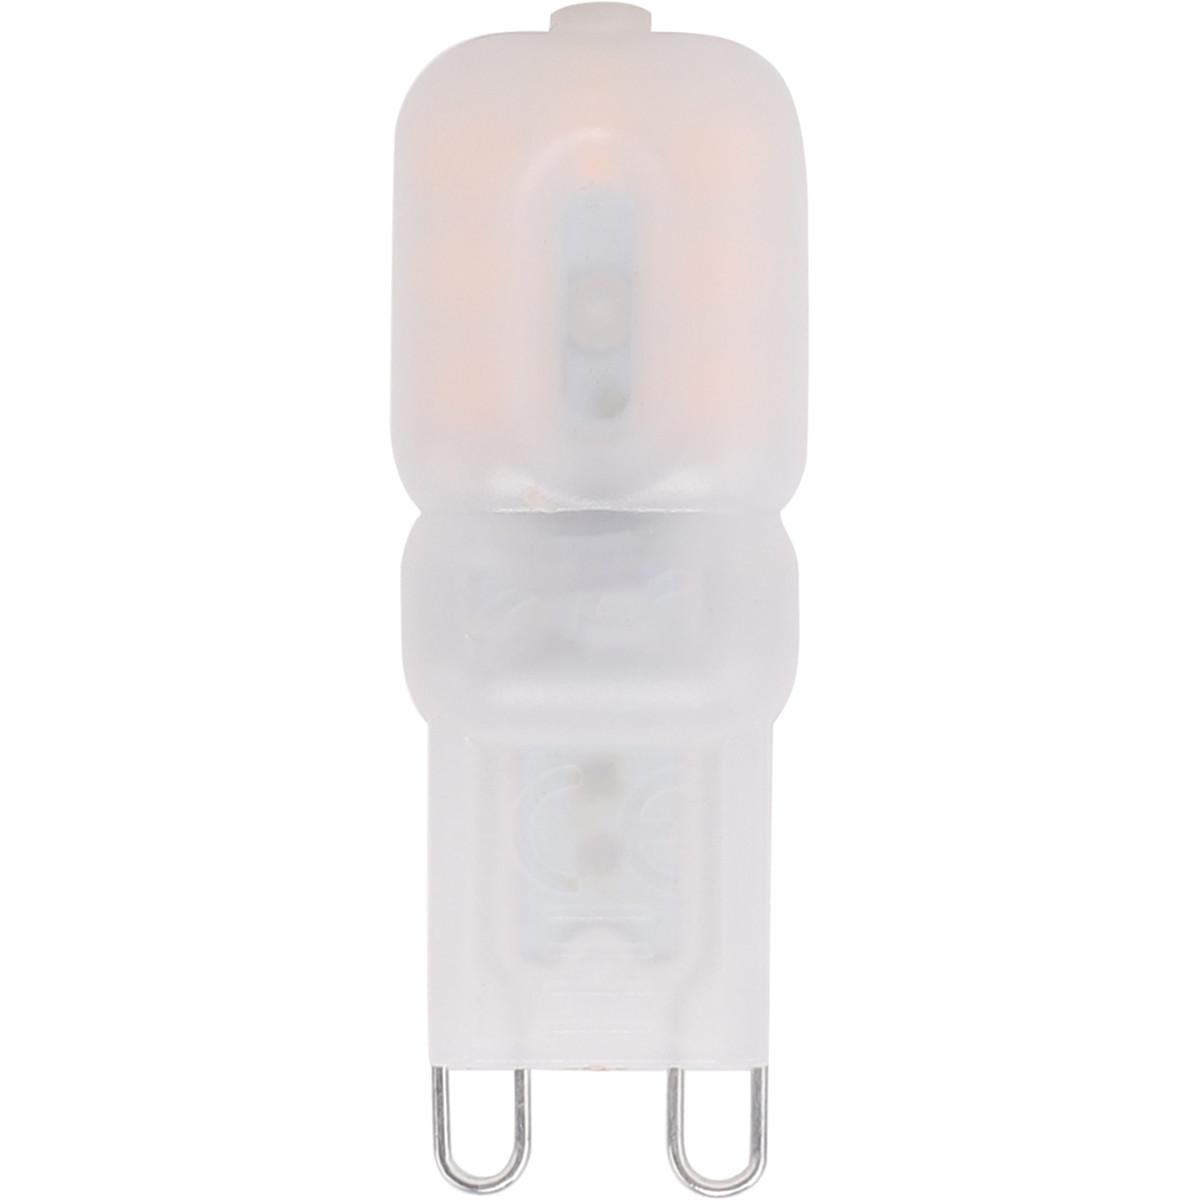 LED Lamp - Aigi - G9 Fitting - 2.5W - Helder/Koud Wit 6500K | Vervangt 25W